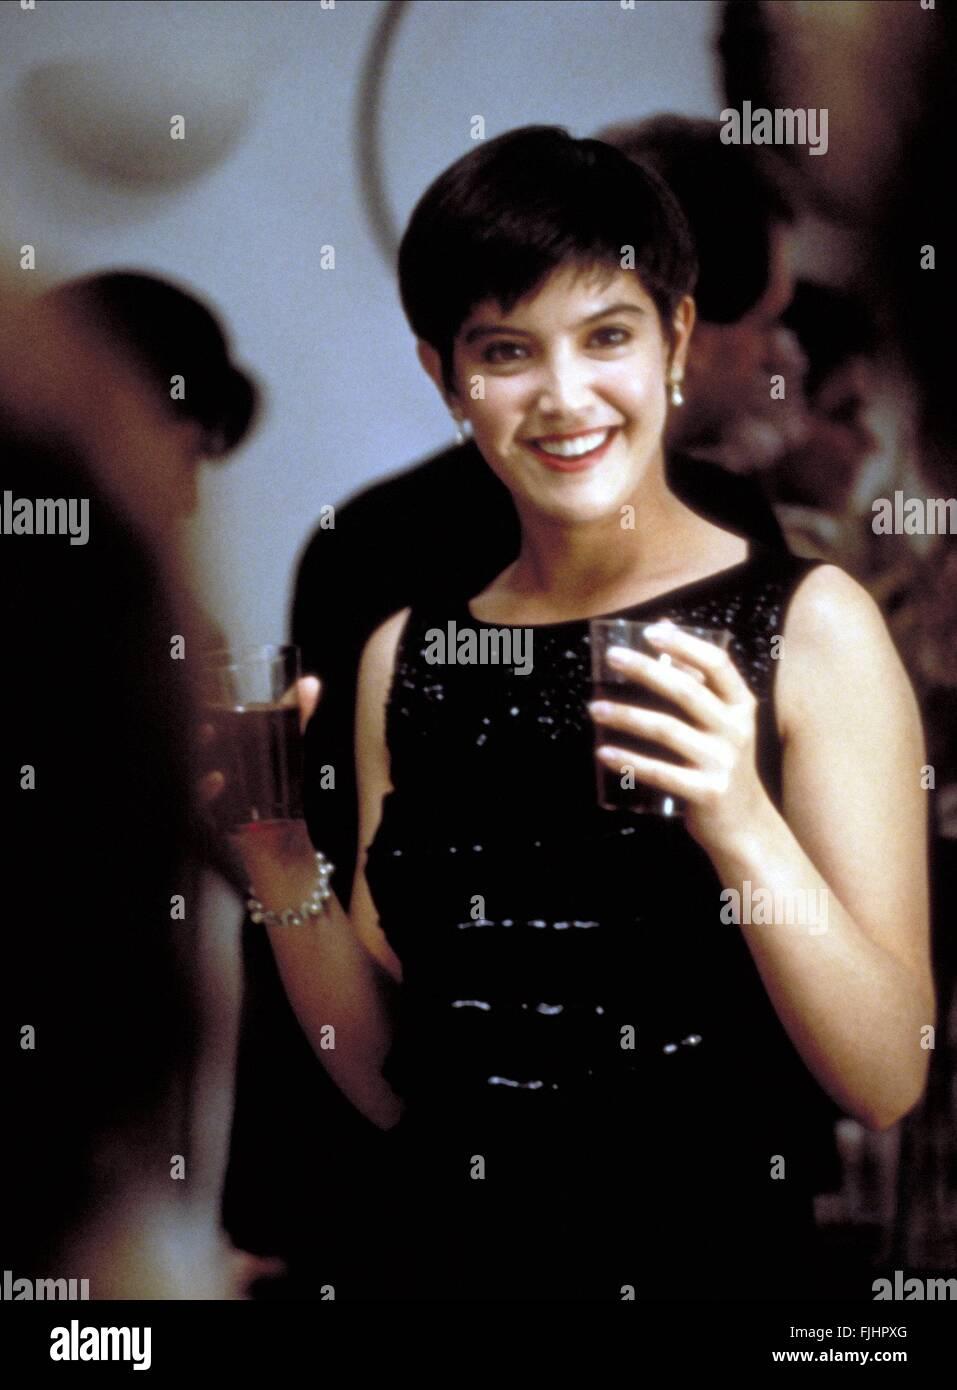 Phoebe cates bright lights big city 1988 stock image